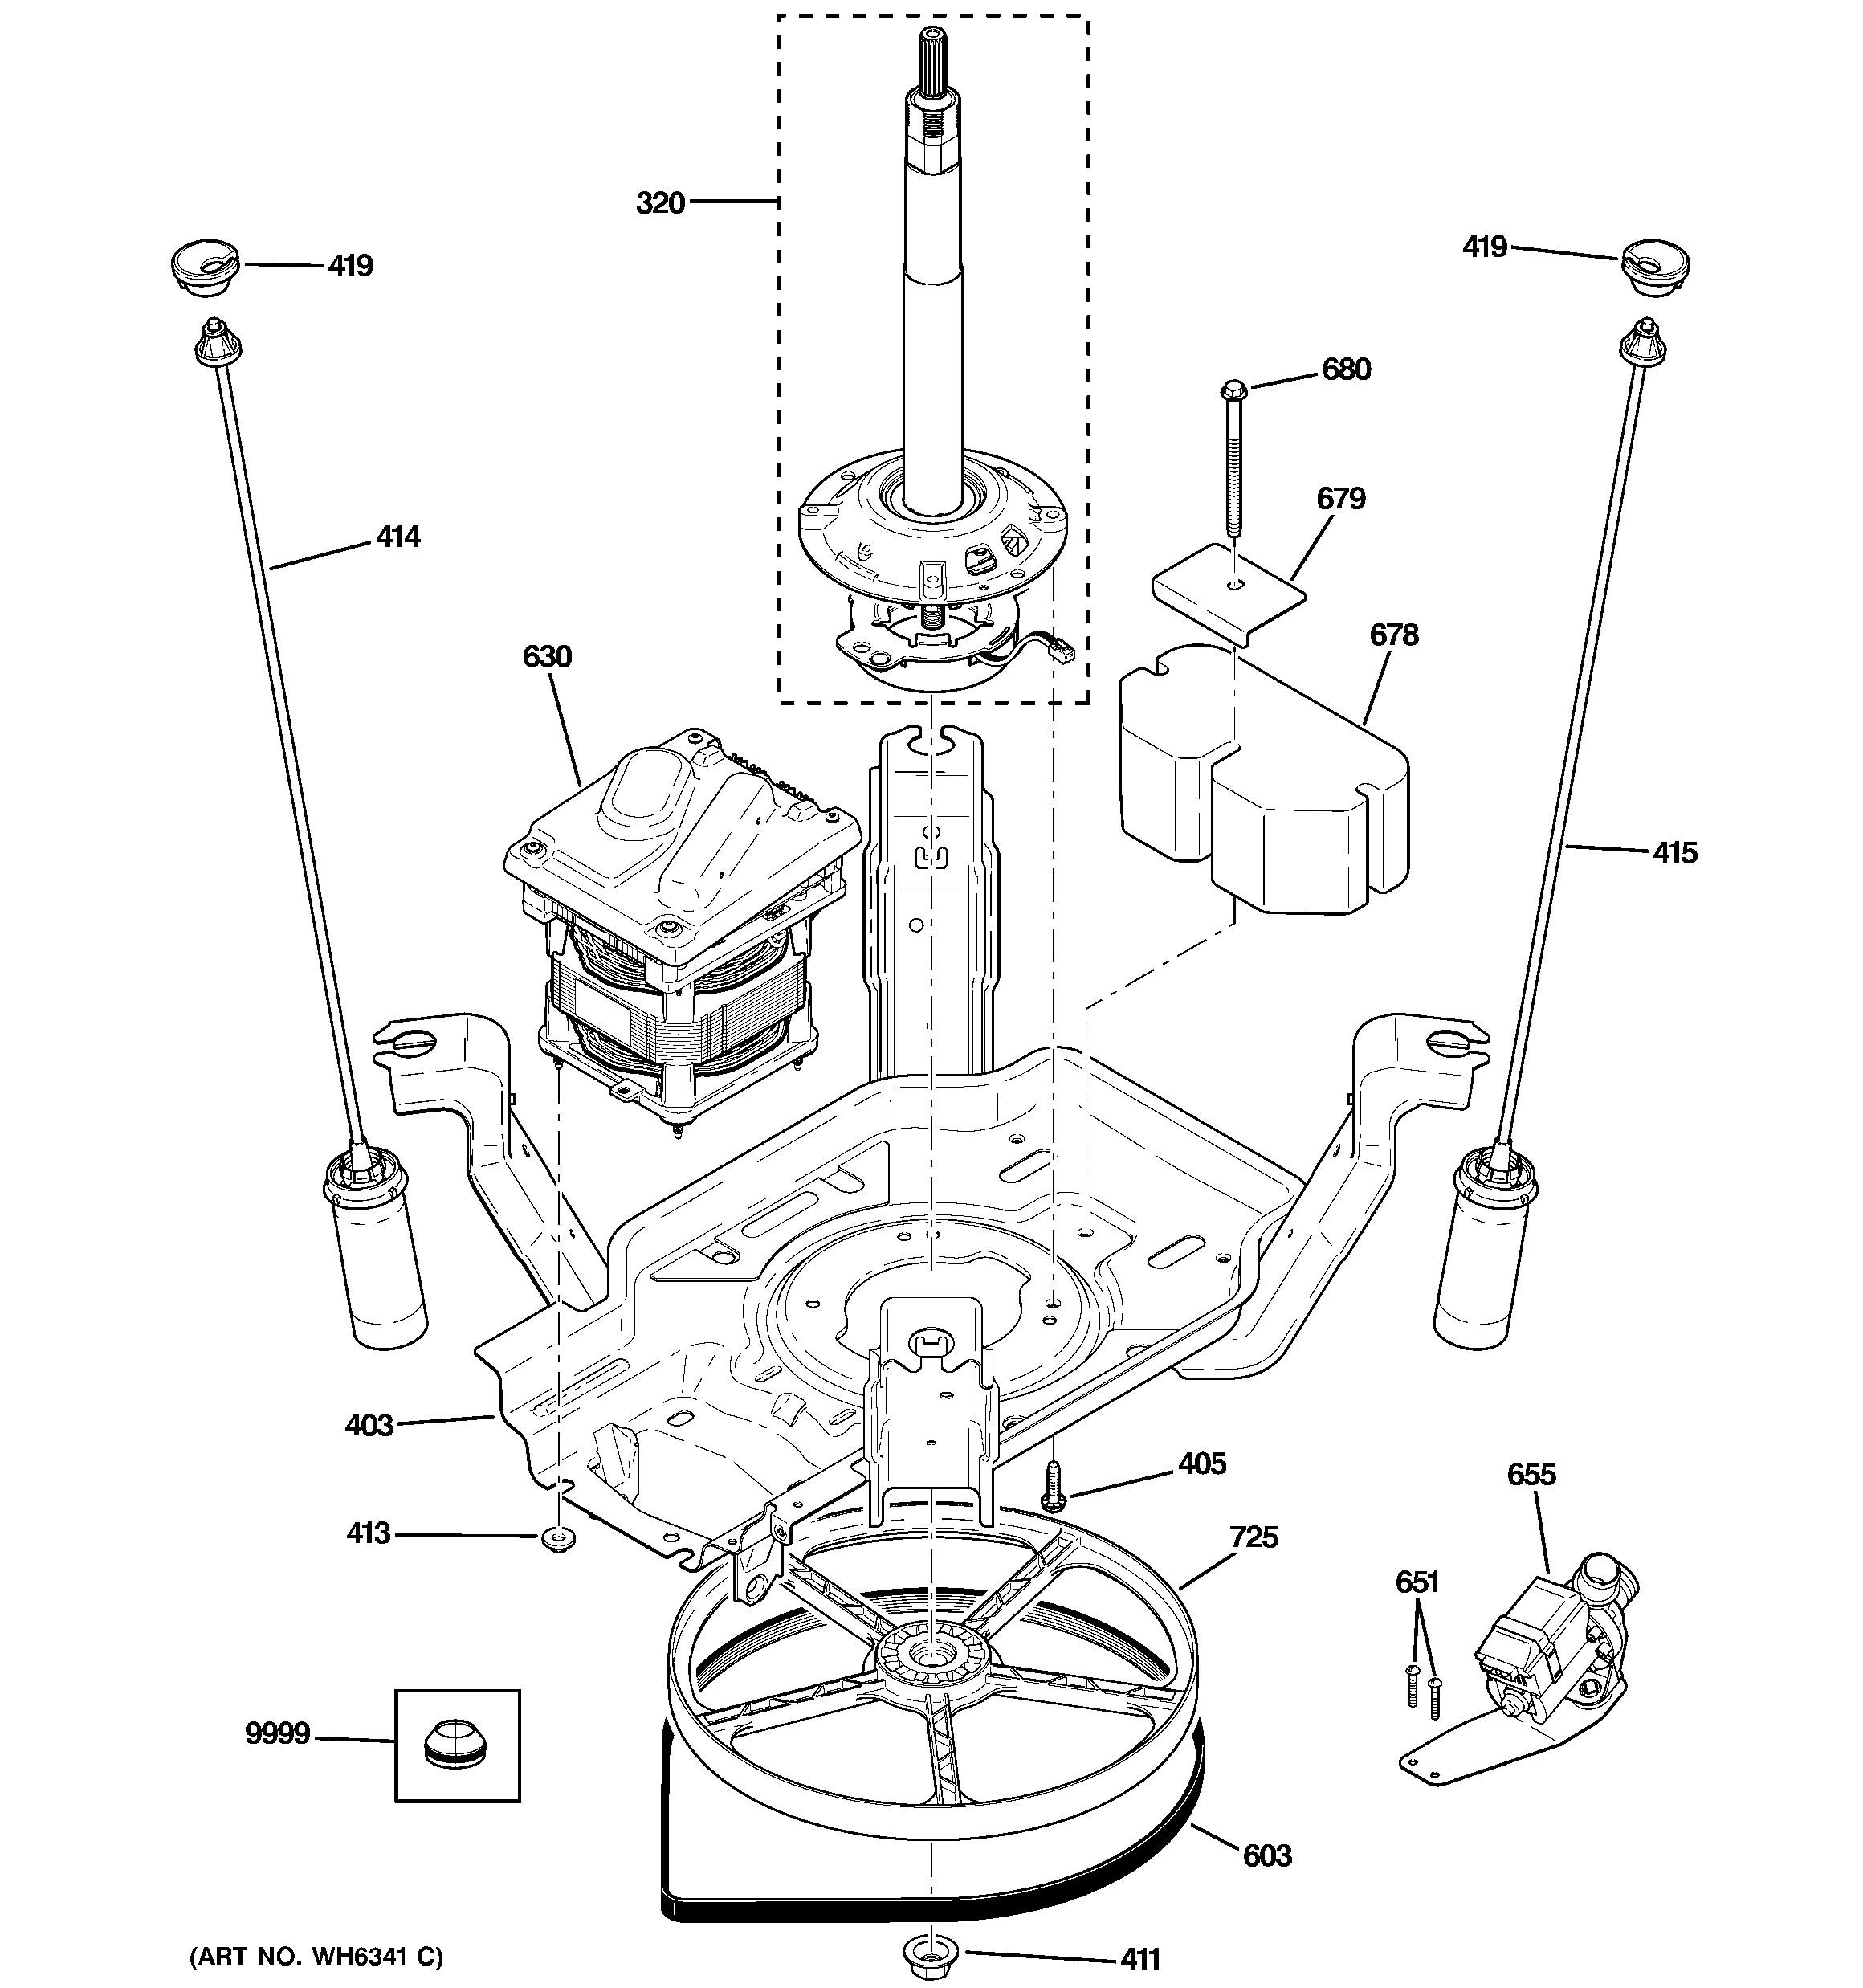 Crossover Wiring Diagram